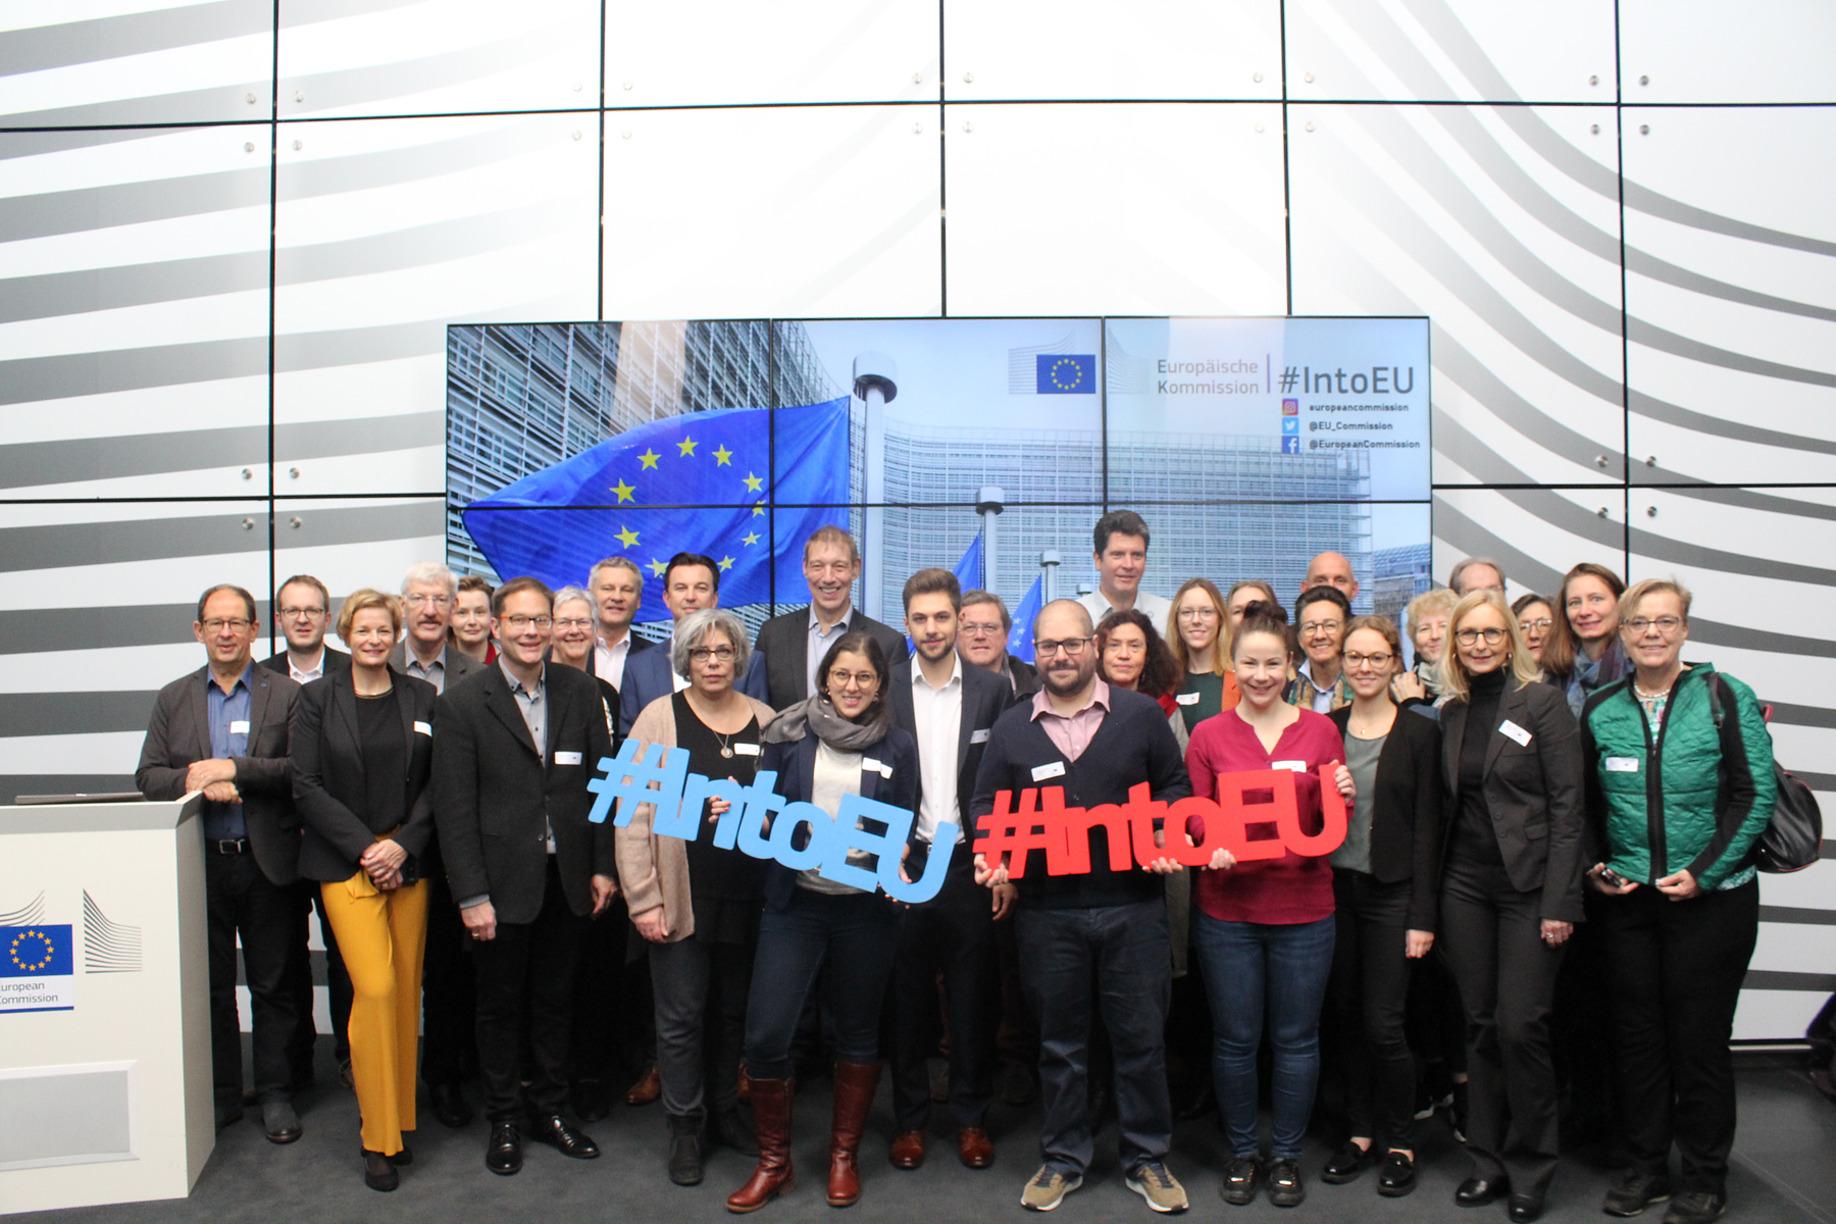 Besuch der EU-Kommission in Brüssel